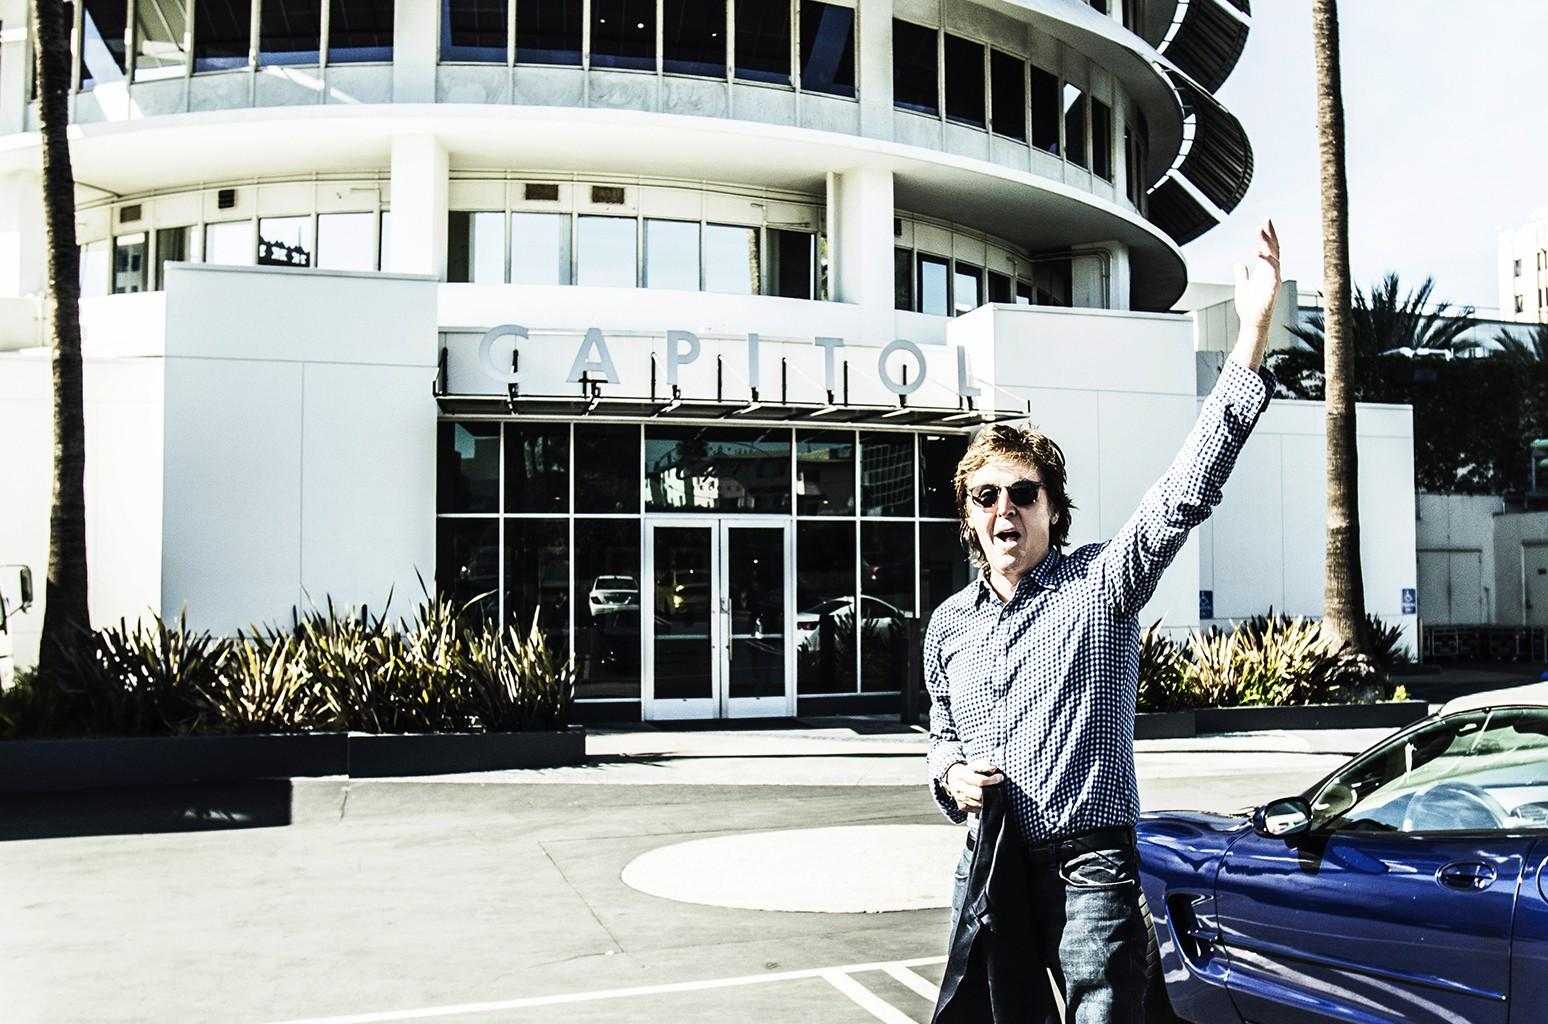 Paul McCartney at Capitol Records